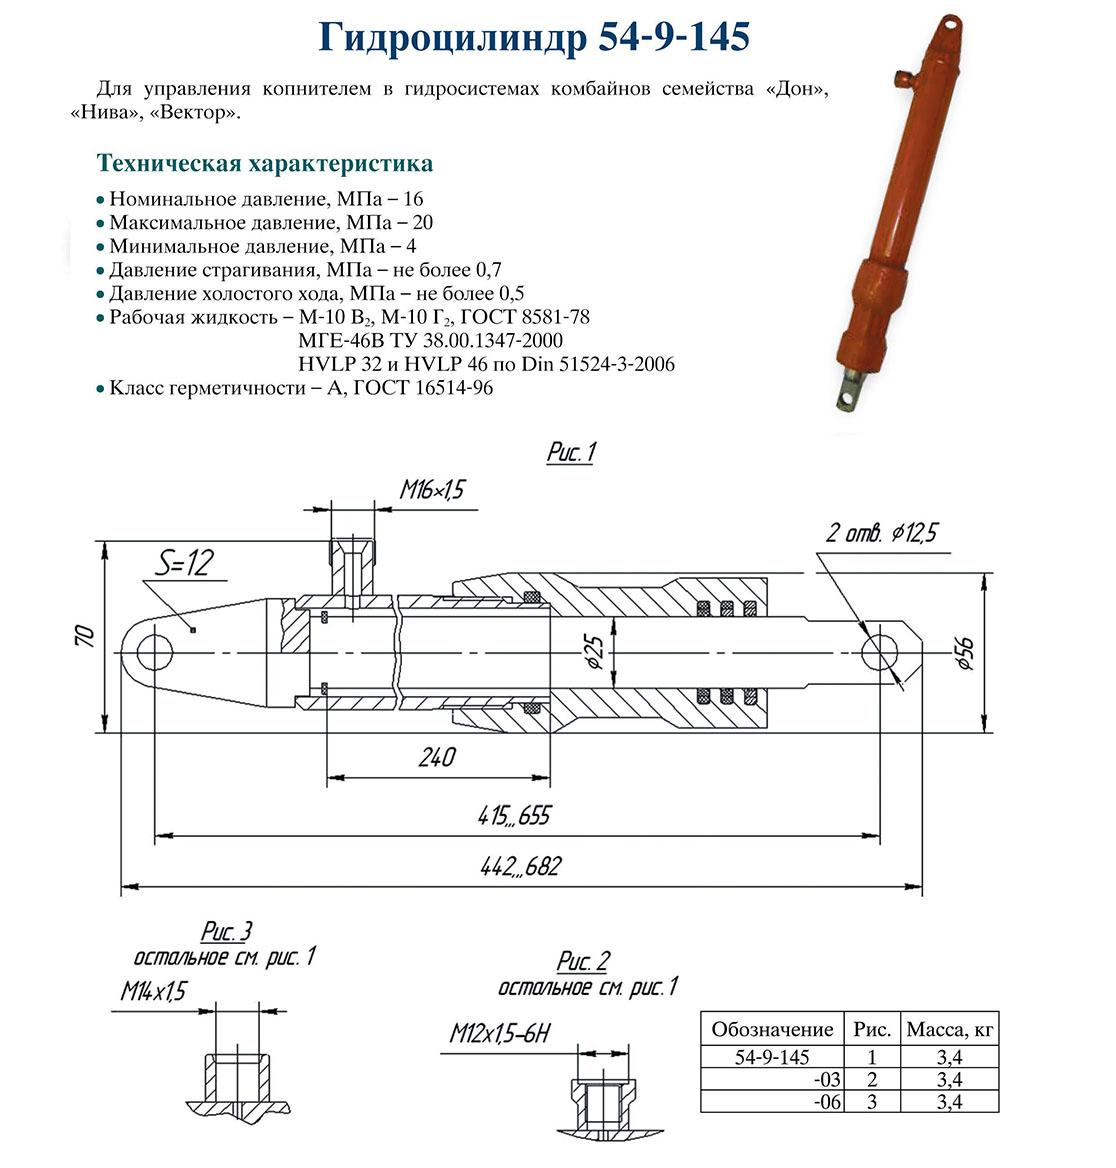 Гидроцилиндр 54-9-145-03 Гидроцилиндр 54-9-145-06